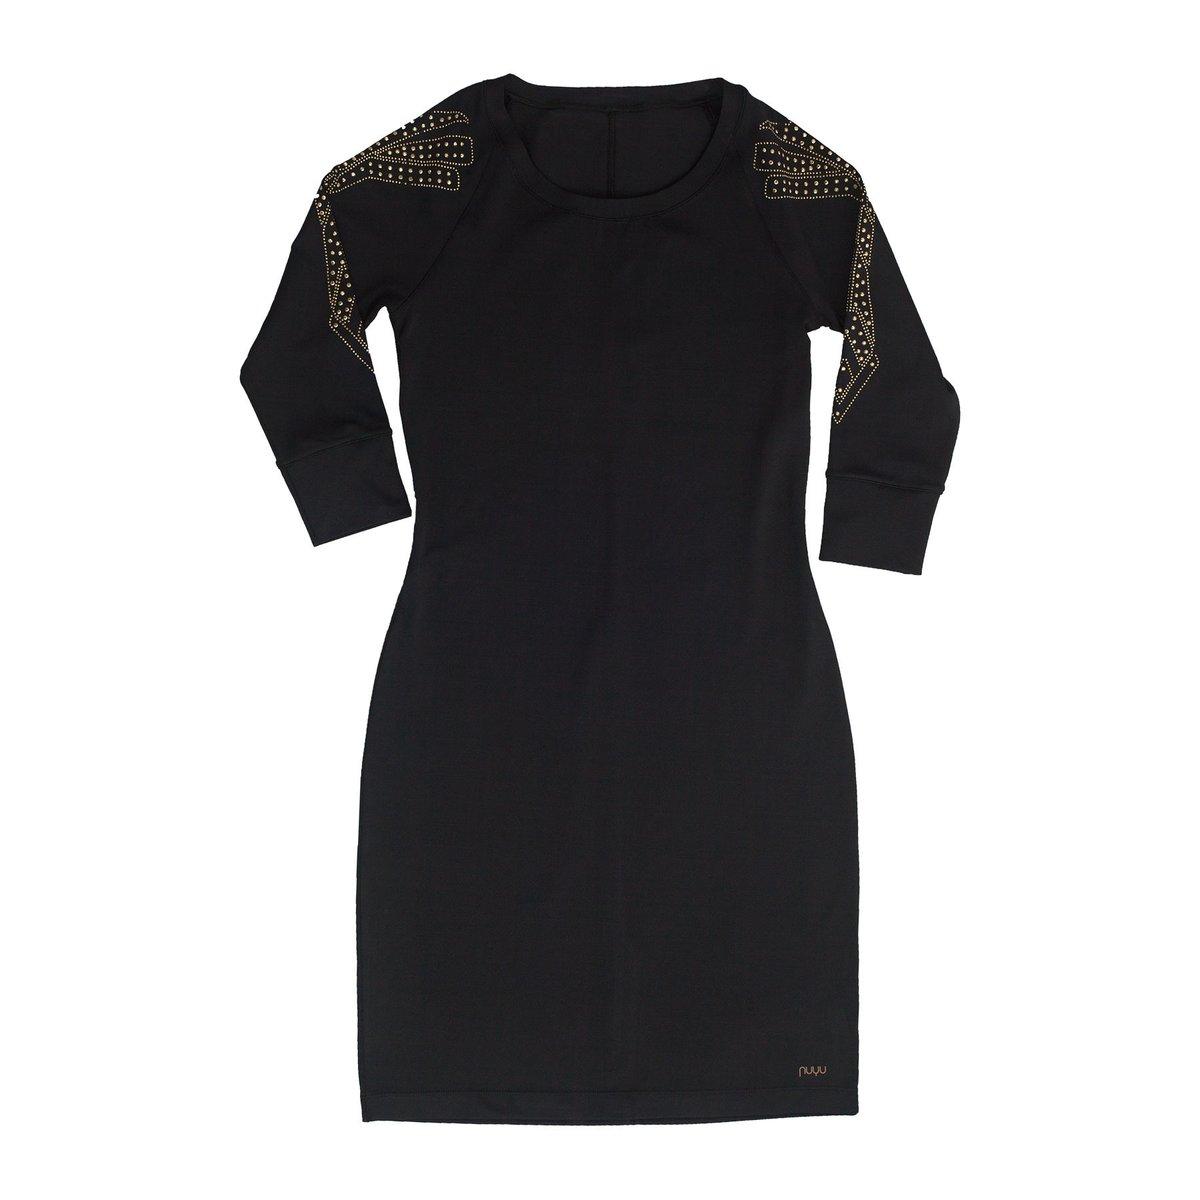 wonder_woman_athletic_apparel_dress.jpg